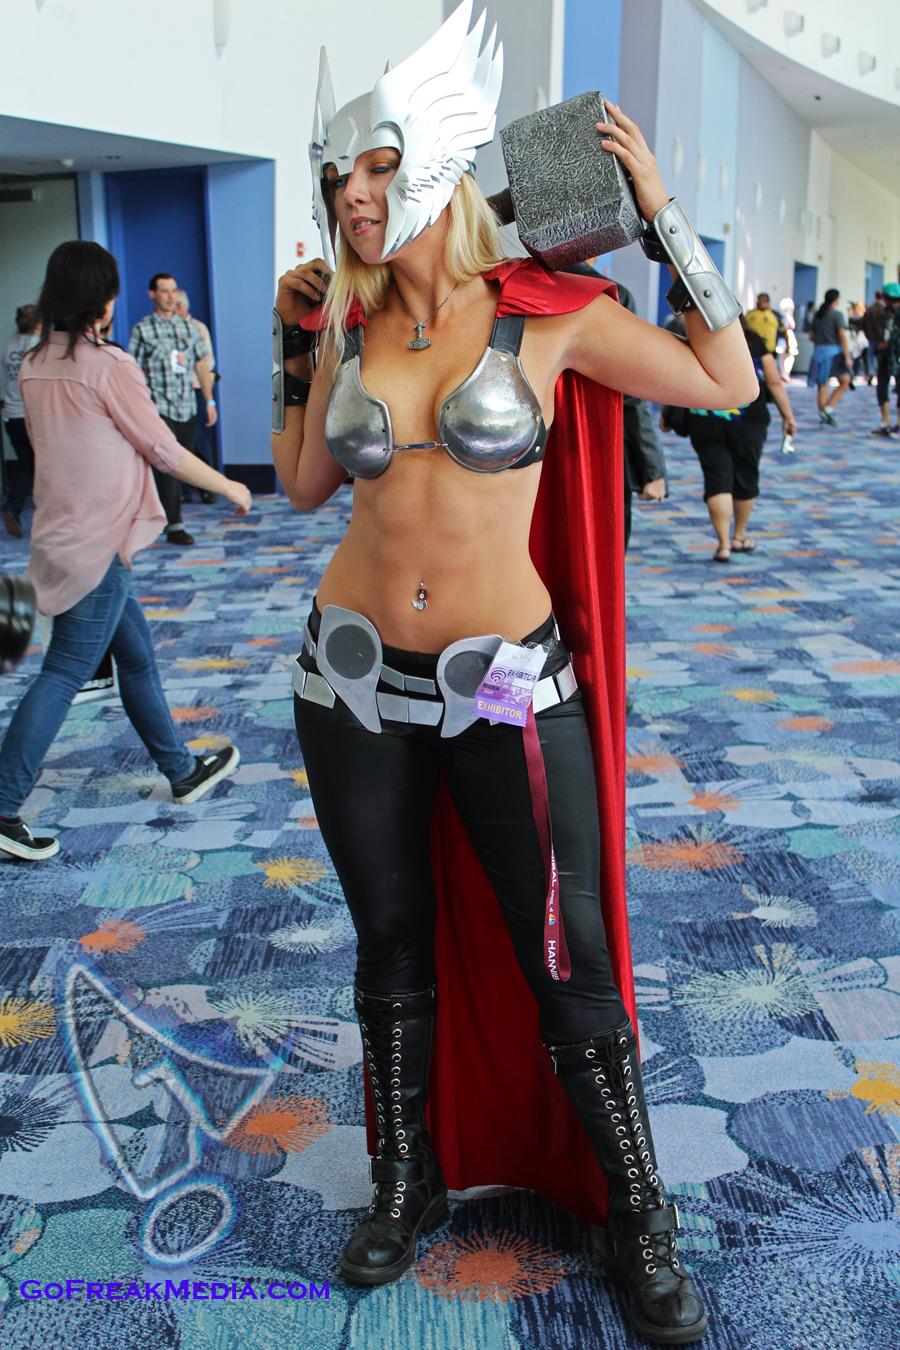 http://img3.wikia.nocookie.net/__cb20130701004217/cosplay/images/5/5b/Female_thor_cosplay_wondercon_2013.jpg